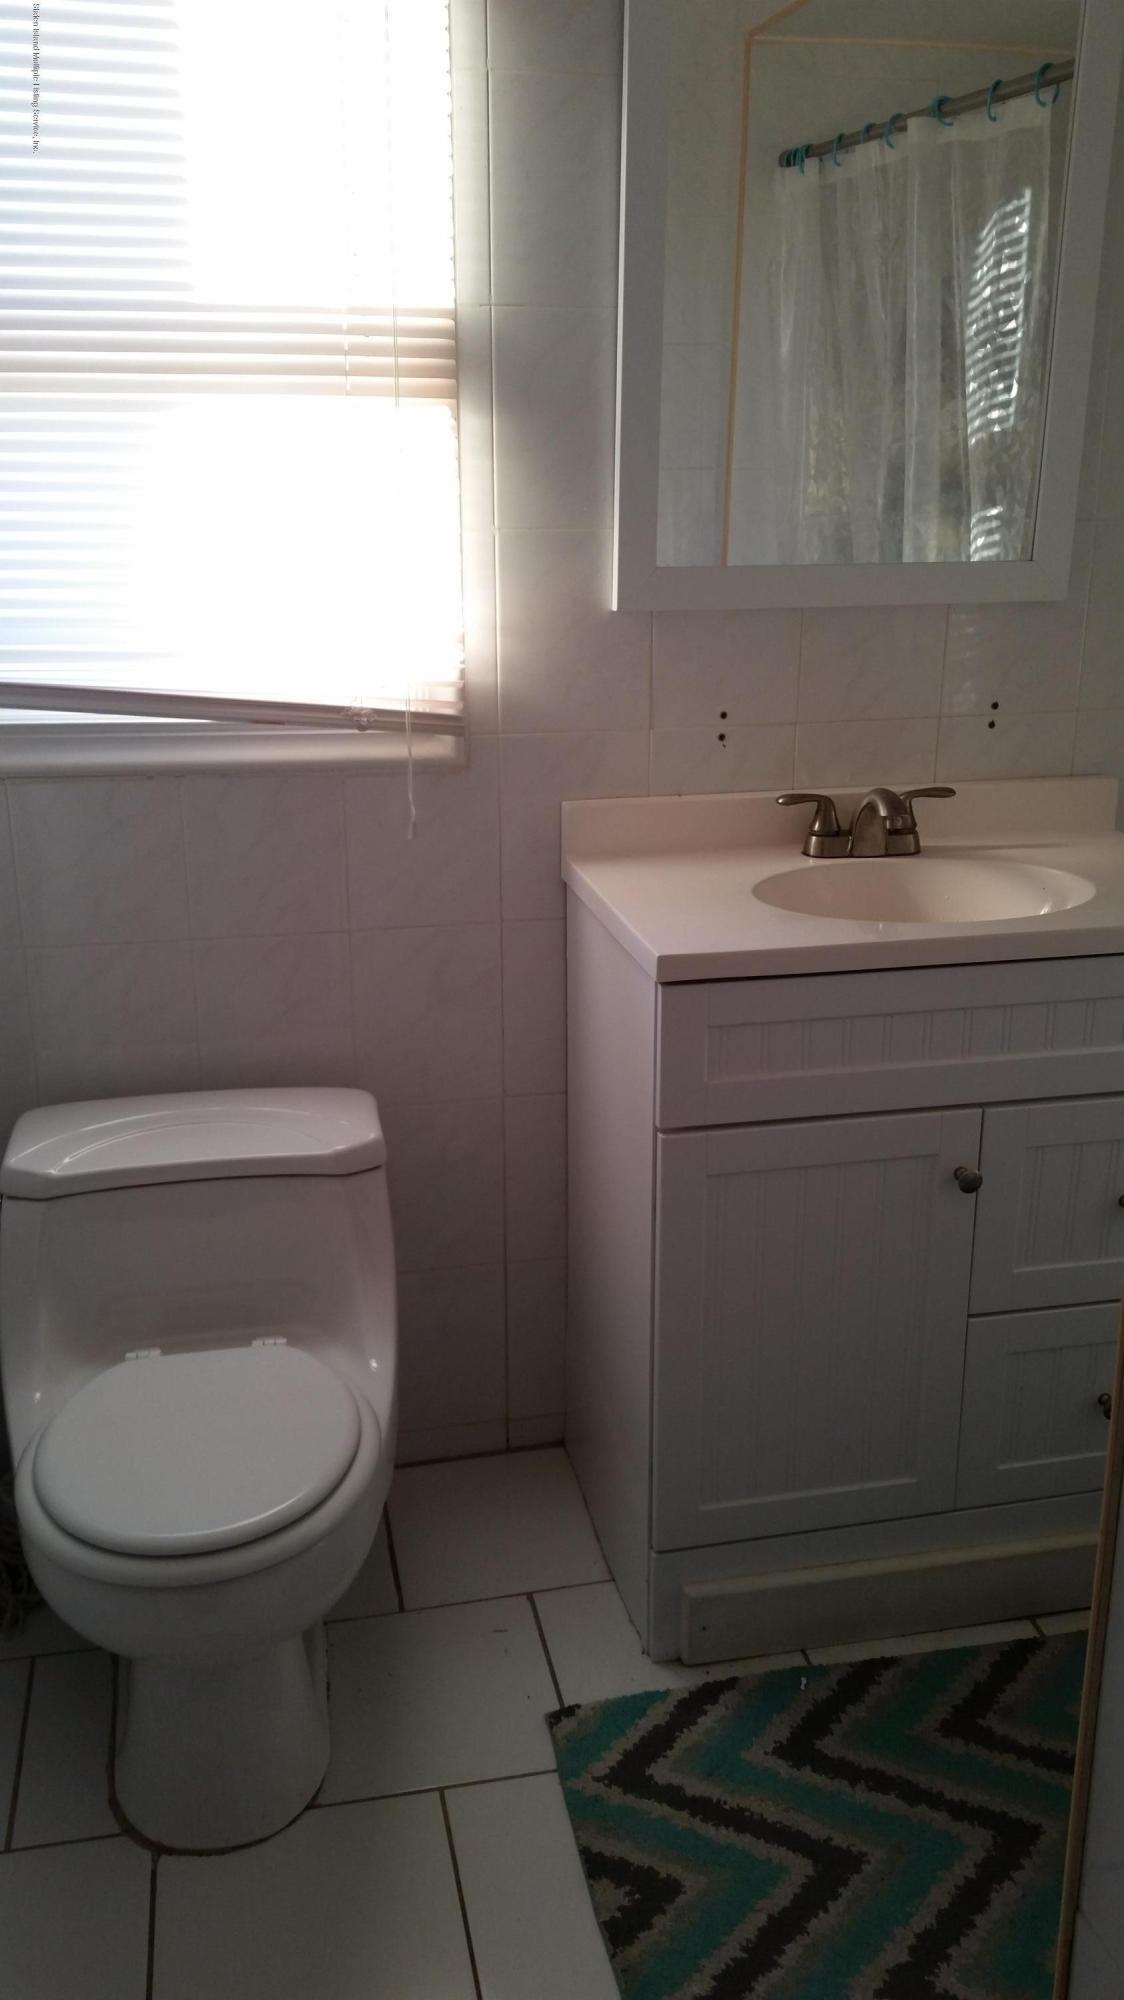 Single Family - Semi-Attached 319 Finley Avenue  Staten Island, NY 10306, MLS-1124845-14